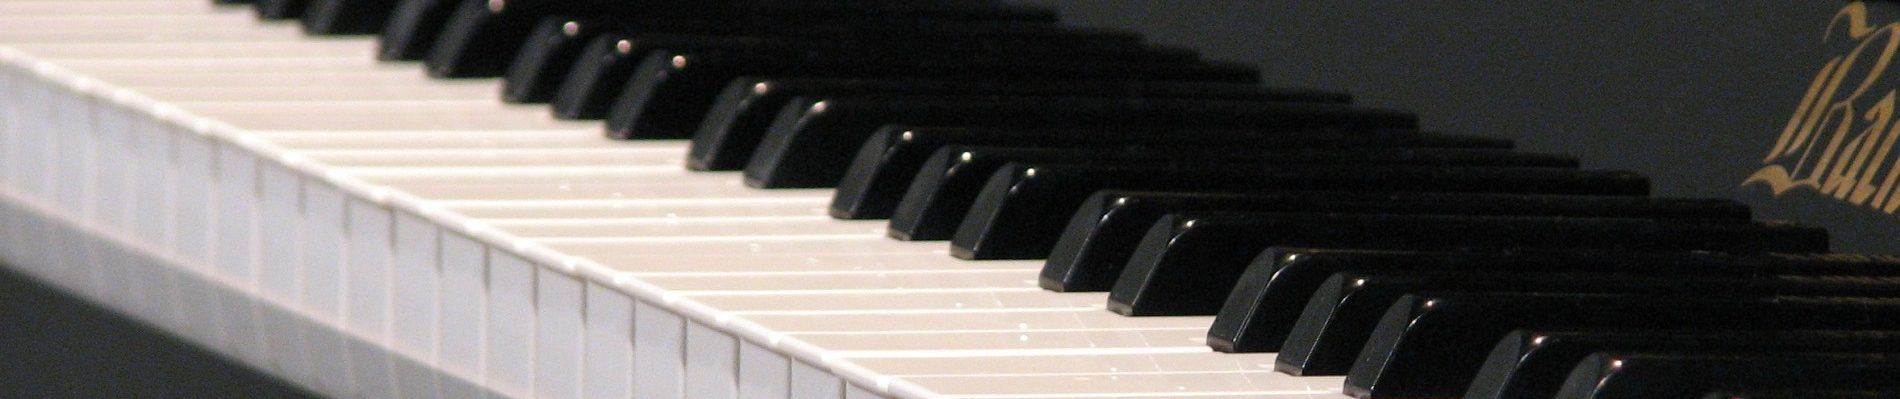 Gingrich Piano Studio